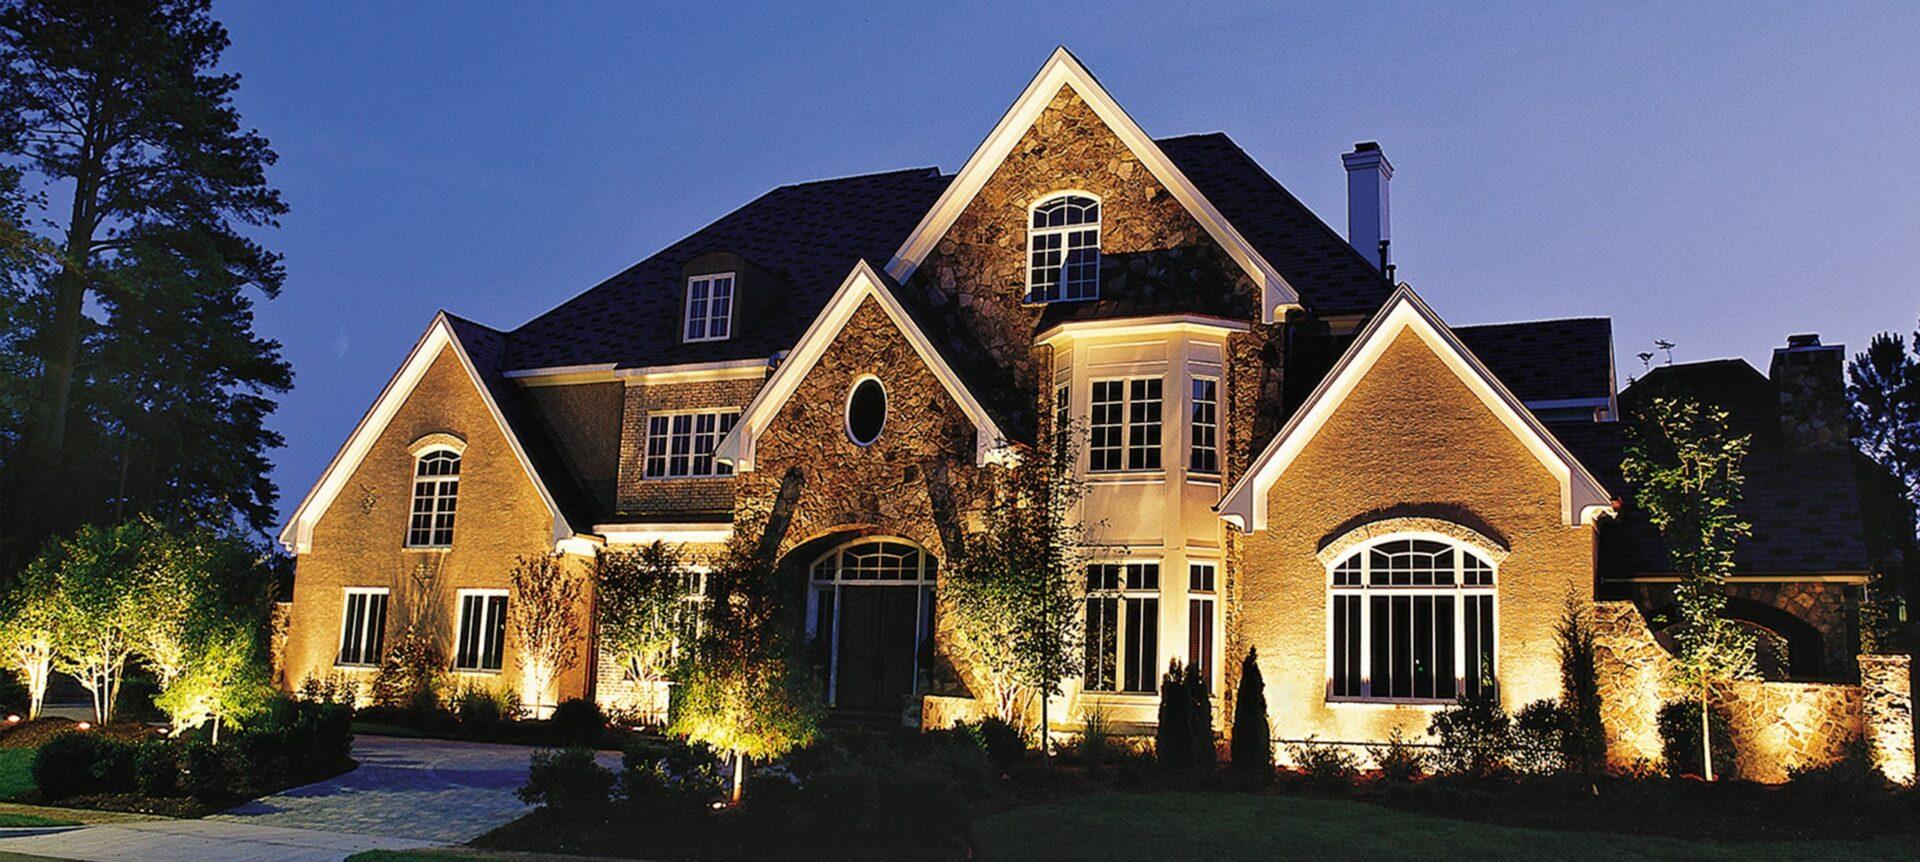 lighting system install services